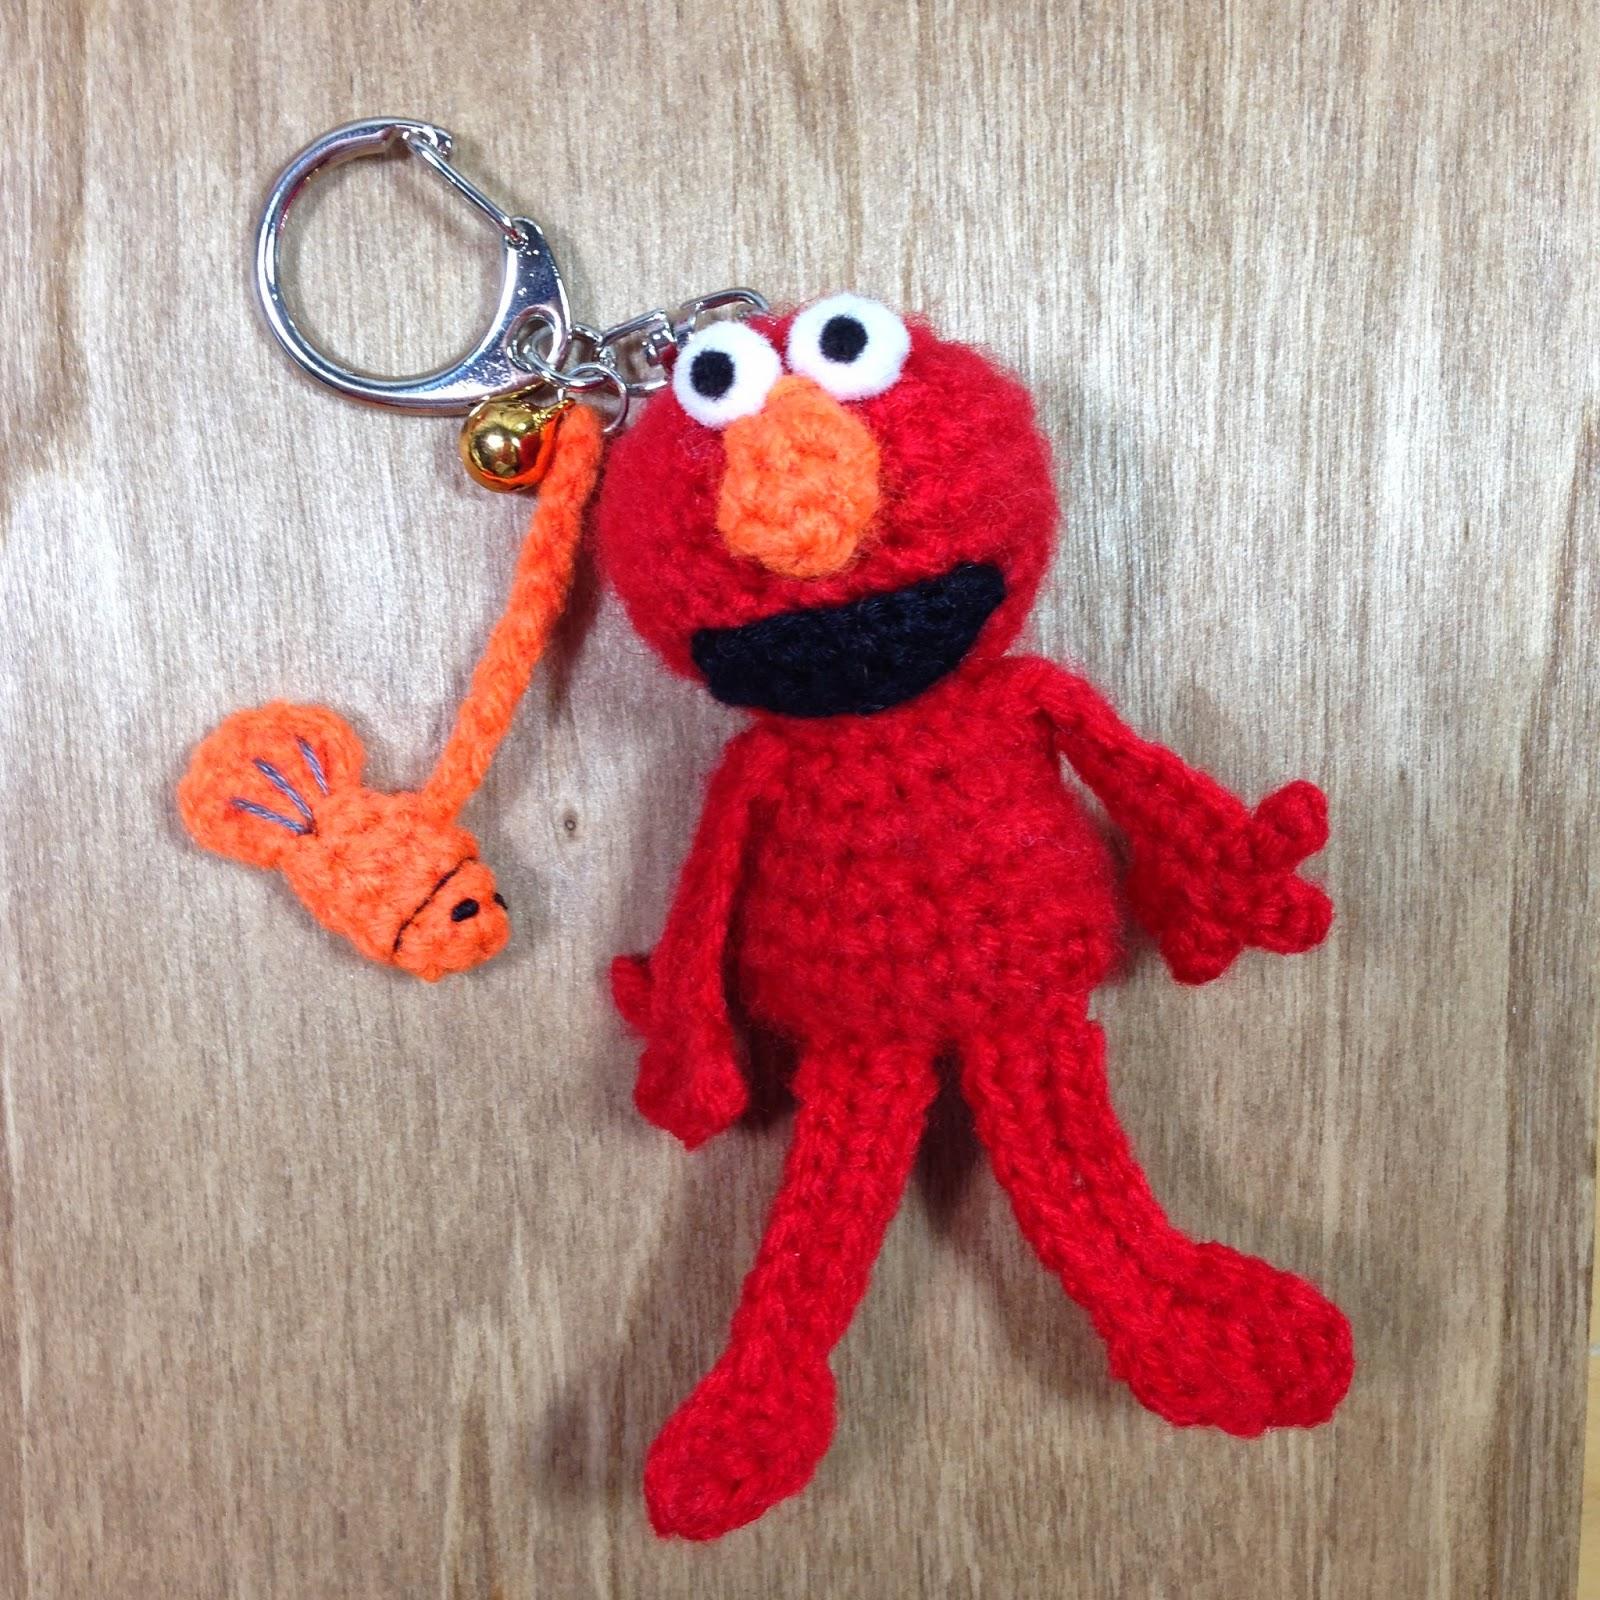 Mini Crochet Elmo - free crochet / amigurumi pattern & stuff susie made: Mini Crochet Elmo - free crochet / amigurumi pattern